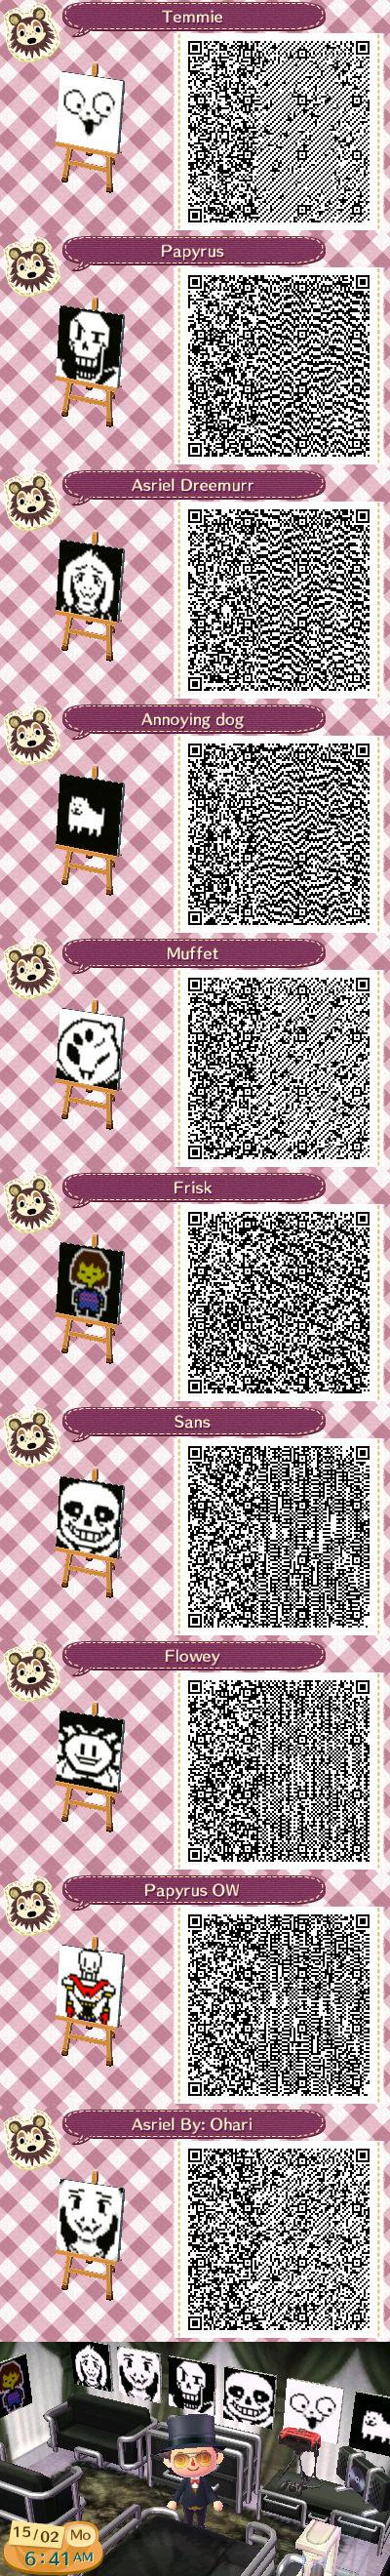 Pin By Danielle Kephart On Animal Crossing Codes Animal Crossing